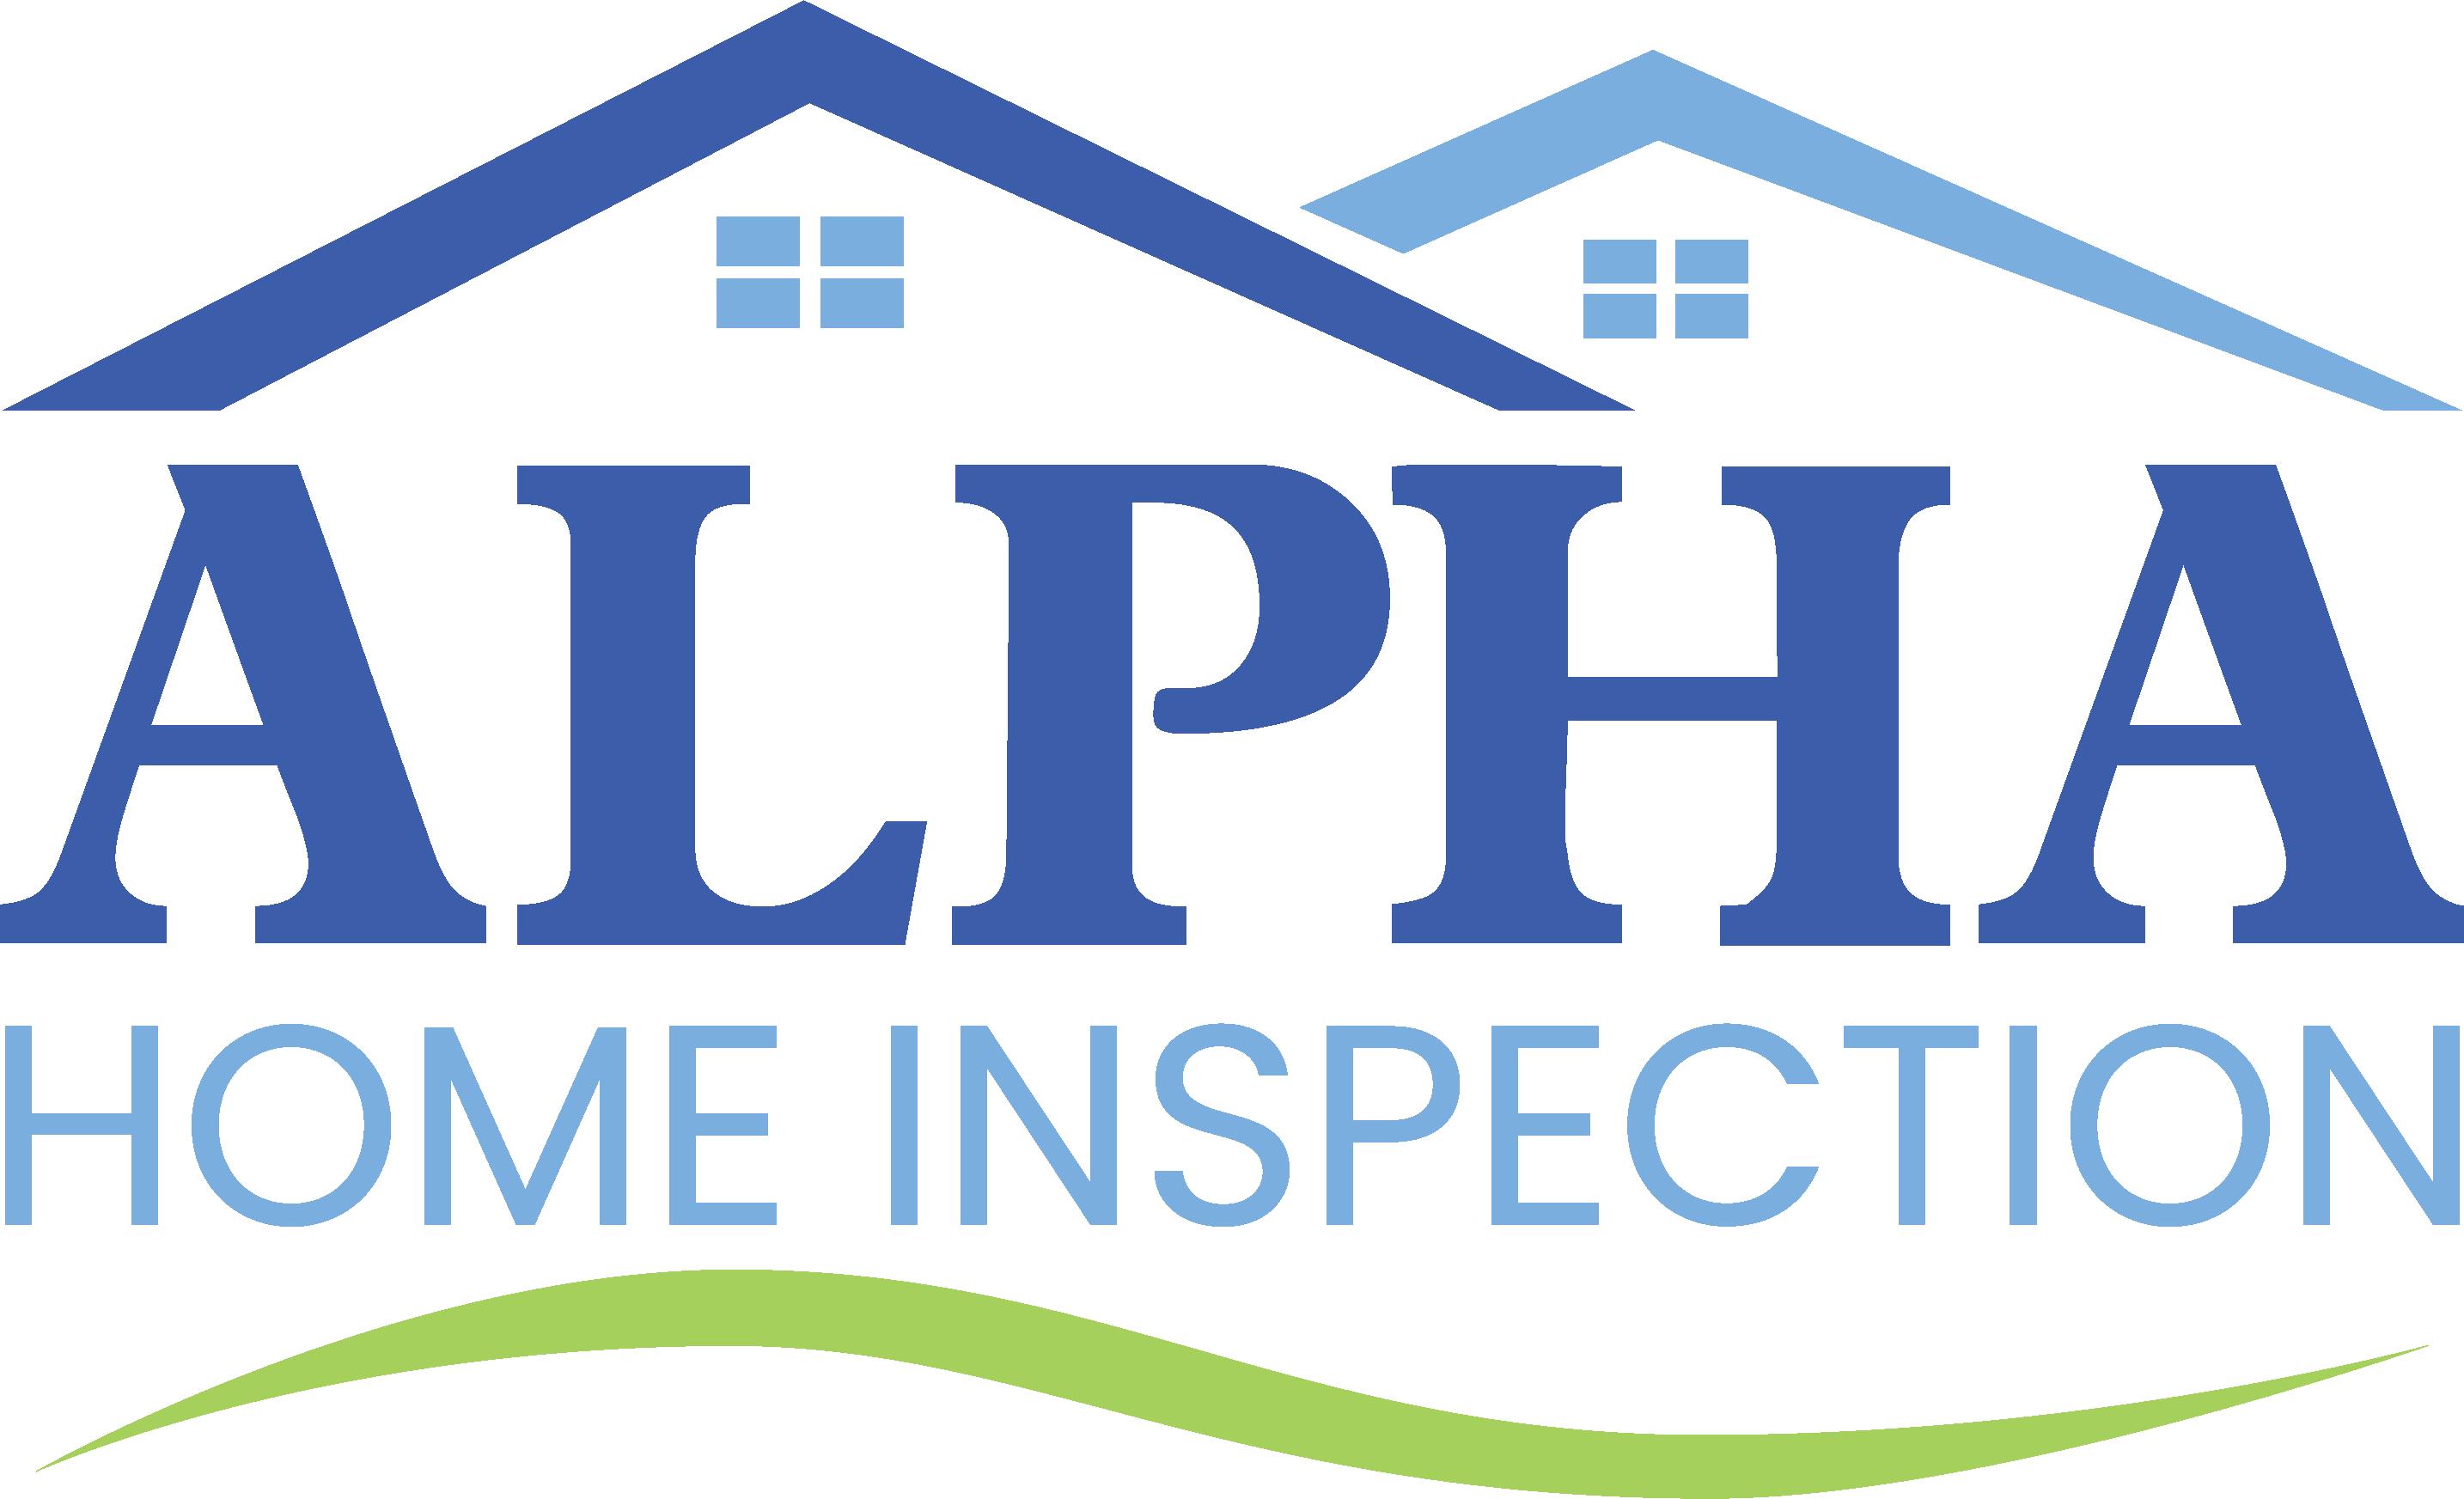 Alpha home inspection new logo